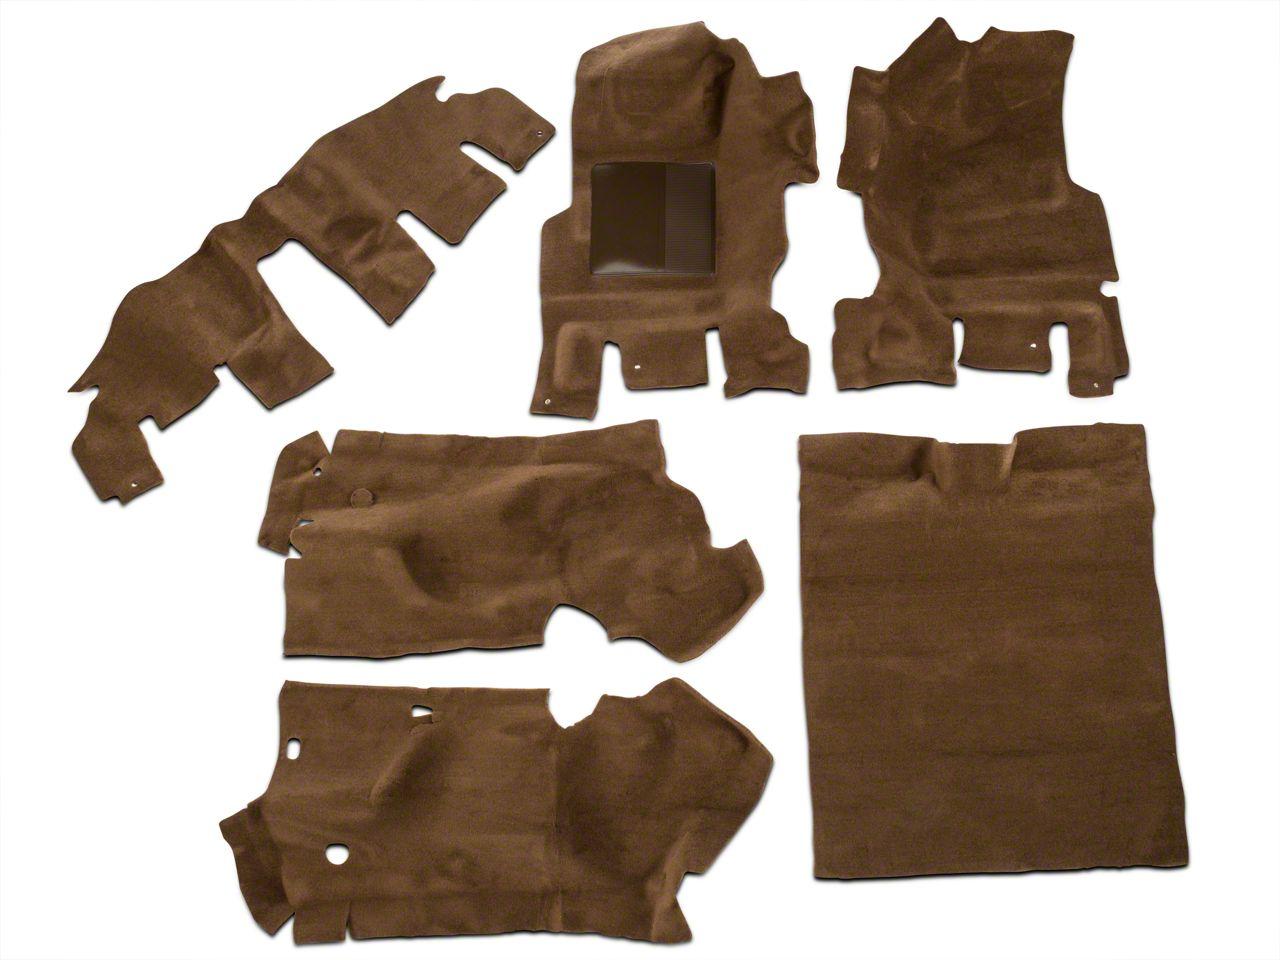 OPR Complete Molded Replacement Carpet - Dark Saddle (97-02 Jeep Wrangler TJ)